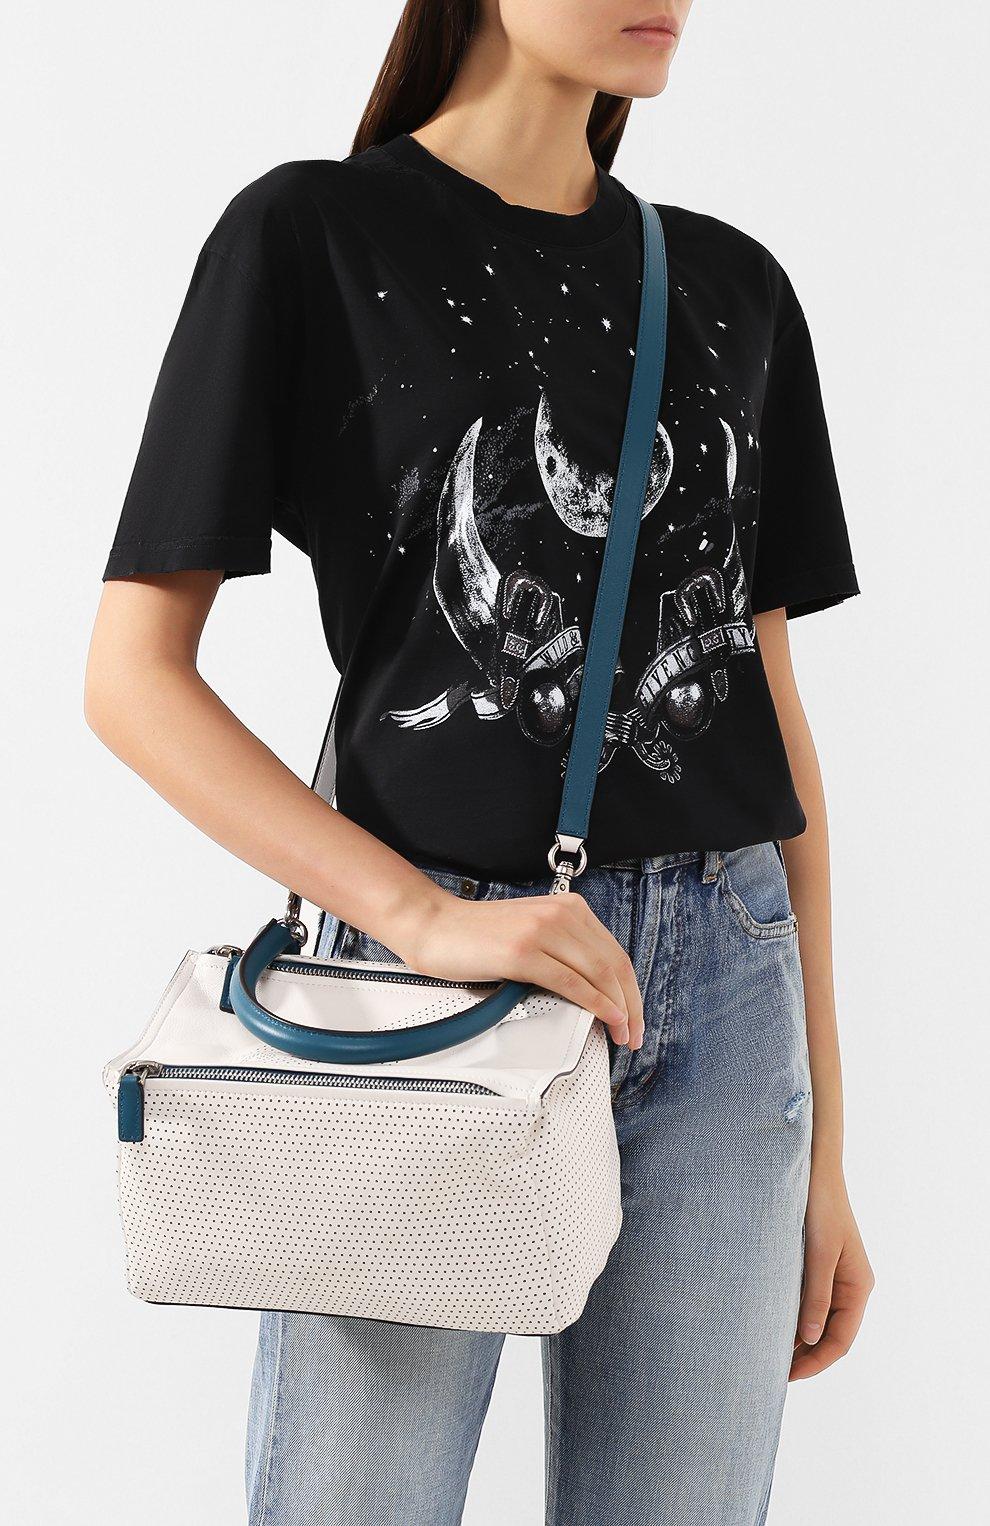 Кожаная сумка Pandora small Givenchy белая цвета | Фото №5